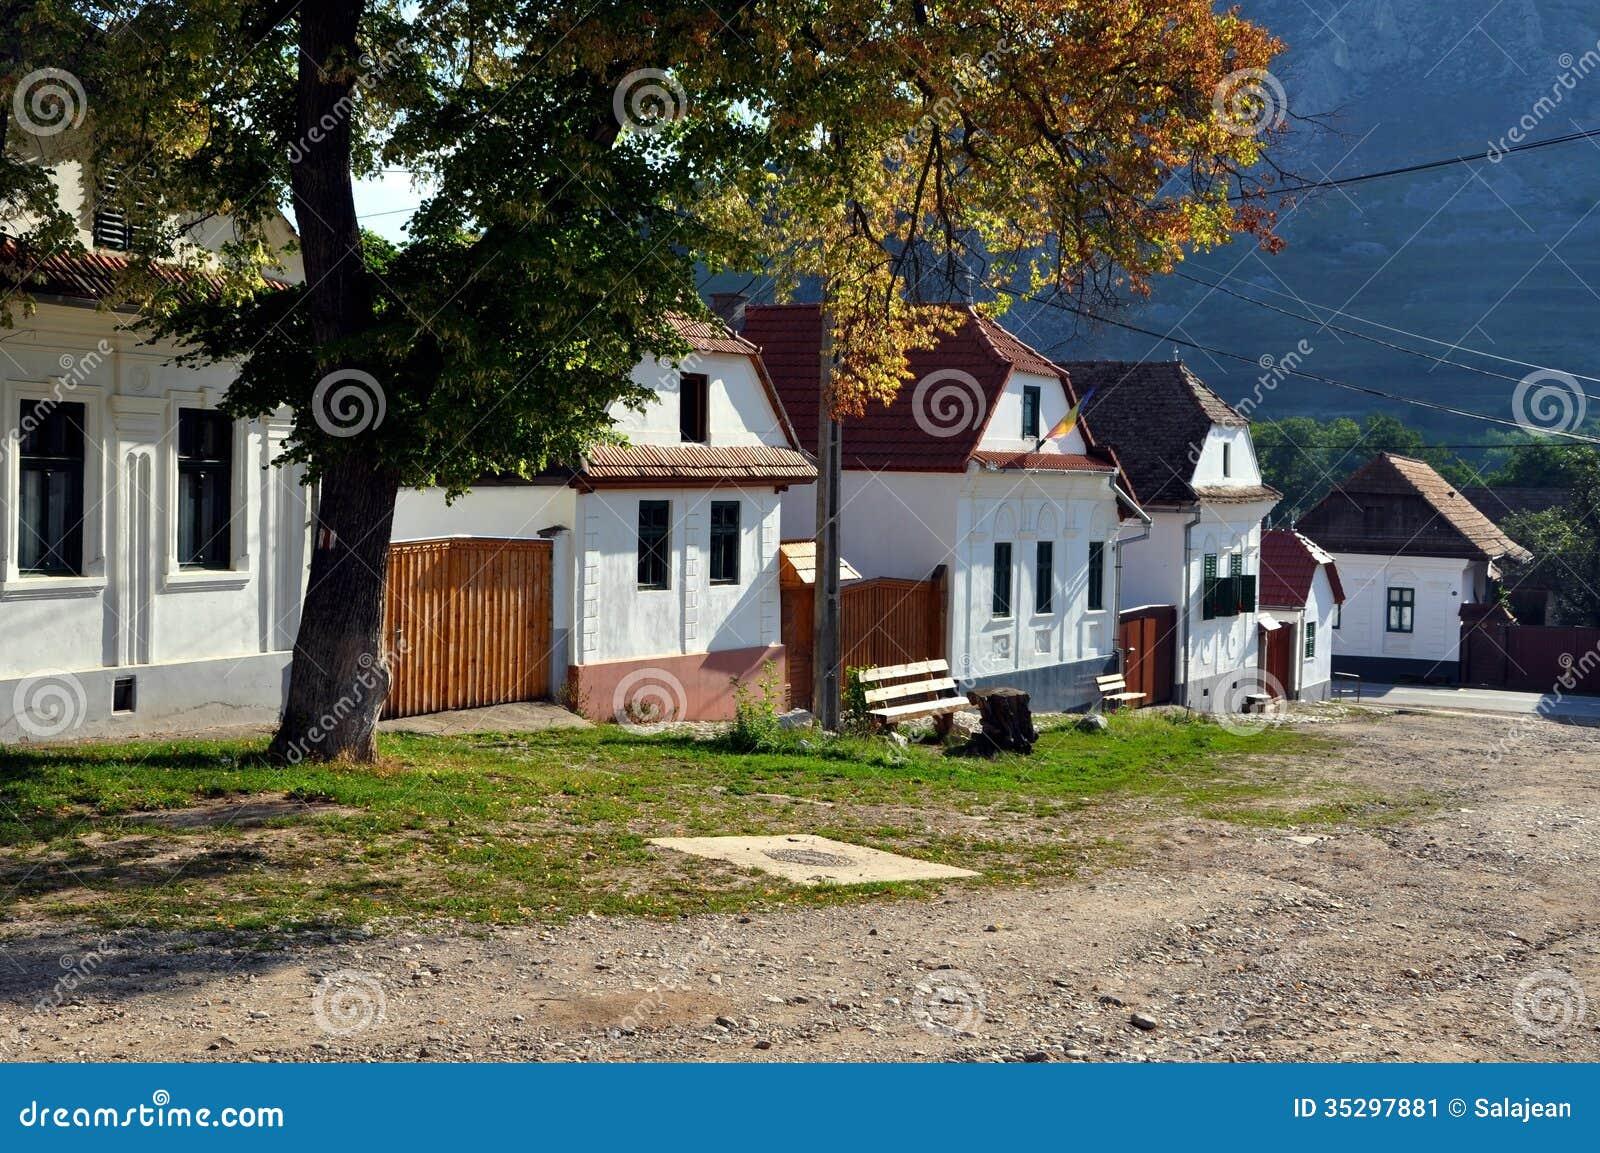 Whitewashed Houses In Torocko Rimetea Village Romania Stock Image Image 35297881